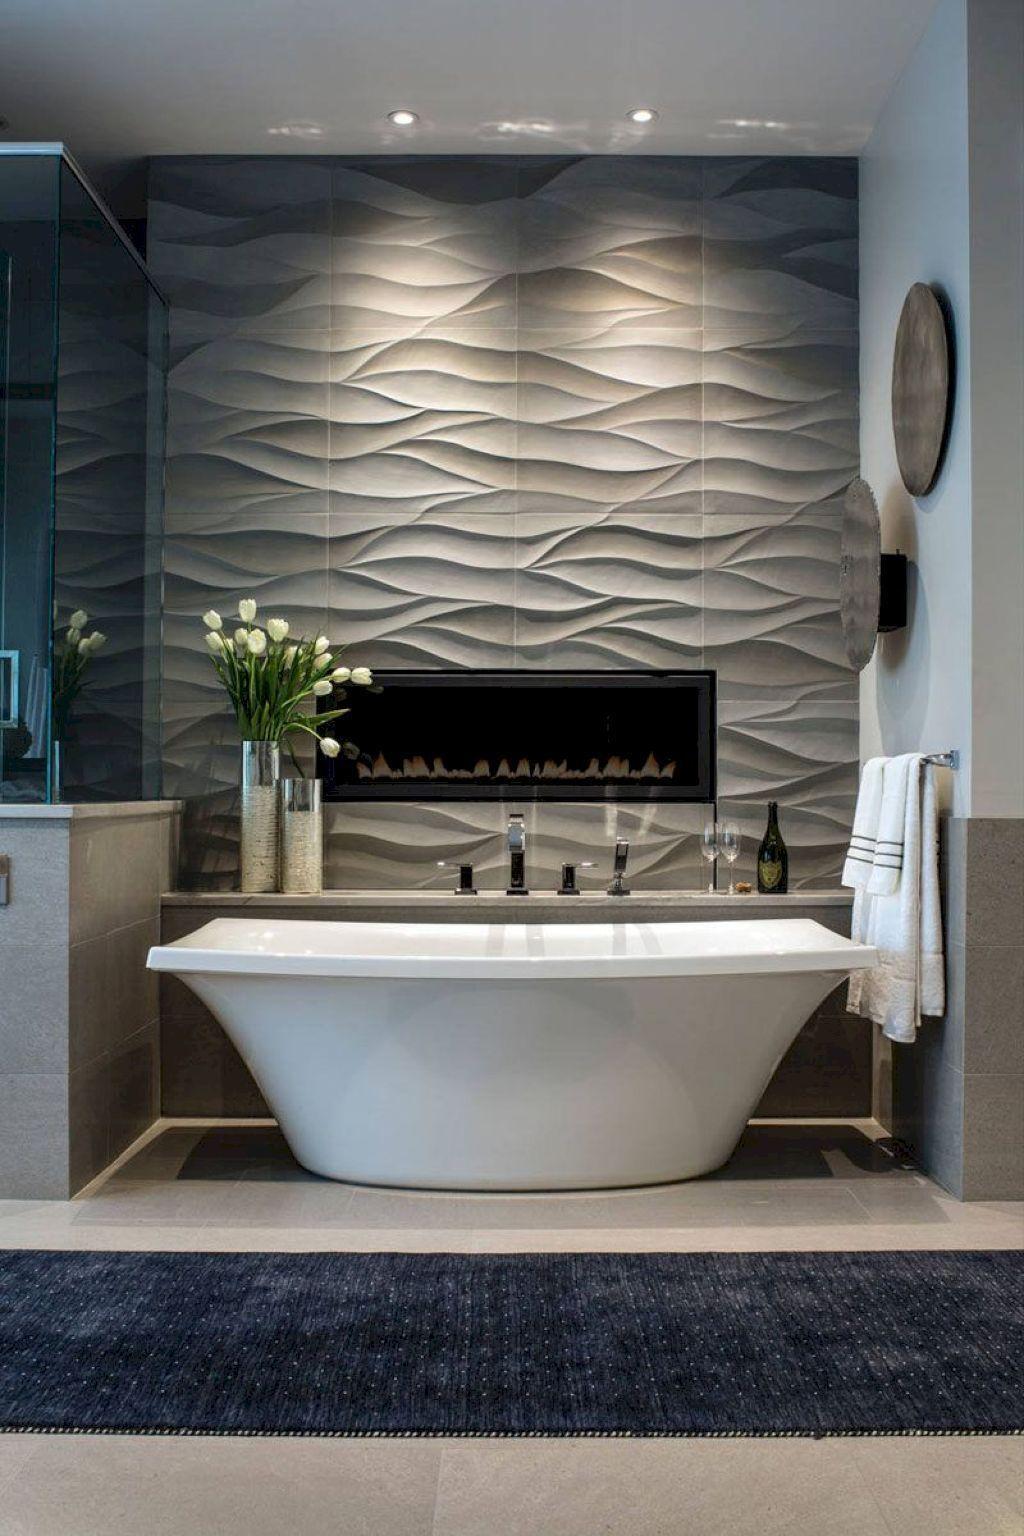 Affordable Small Master Bathroom Remodel Ideas On A Budget 23 Luxurybathroomremodelideas Bathroom Remodel Master Small Master Bathroom Bathroom Design